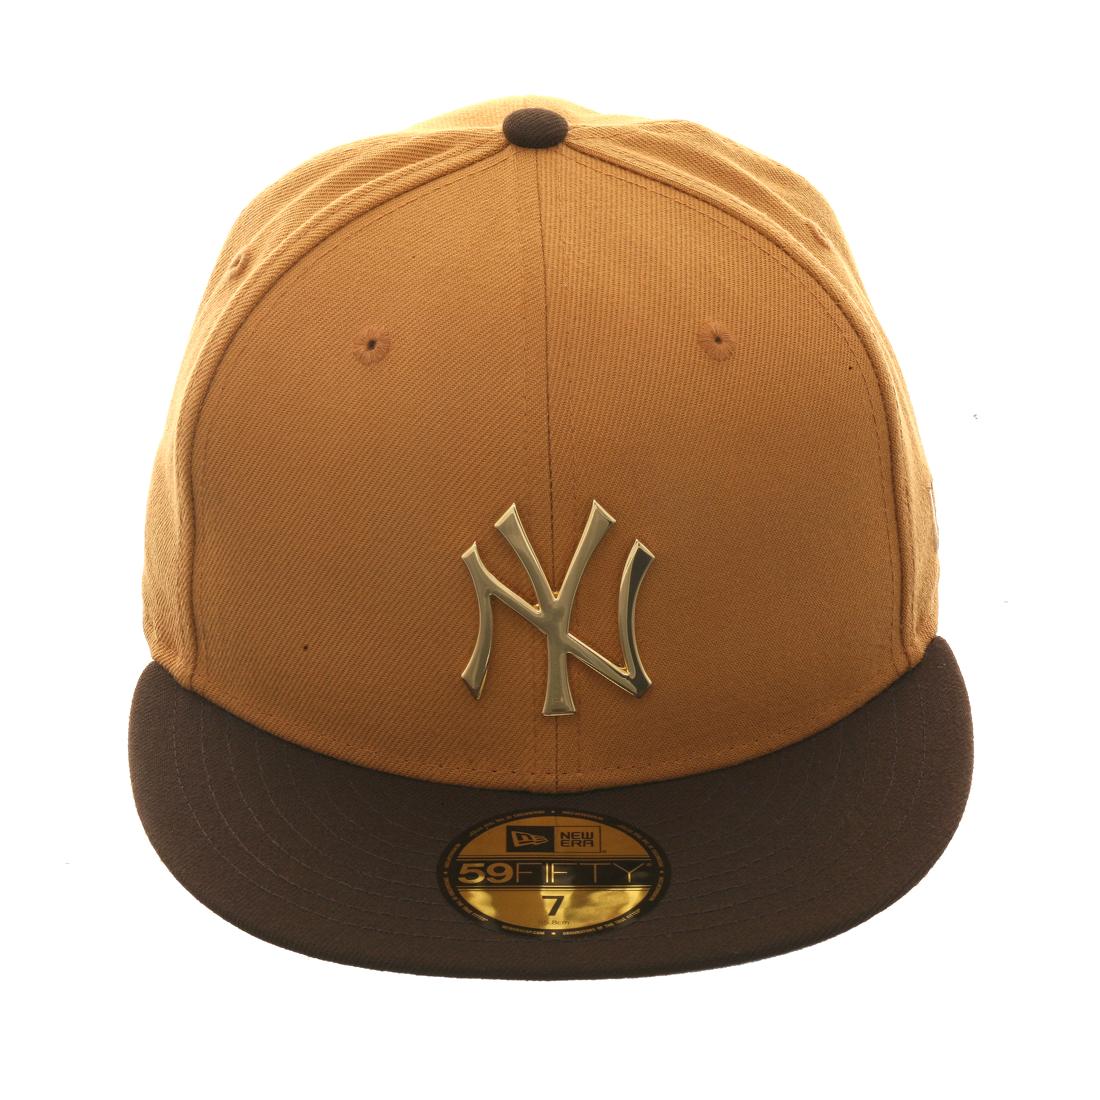 b42aeabe3a6 Exclusive New Era New York Yankees Metal Hat - 2T Tan